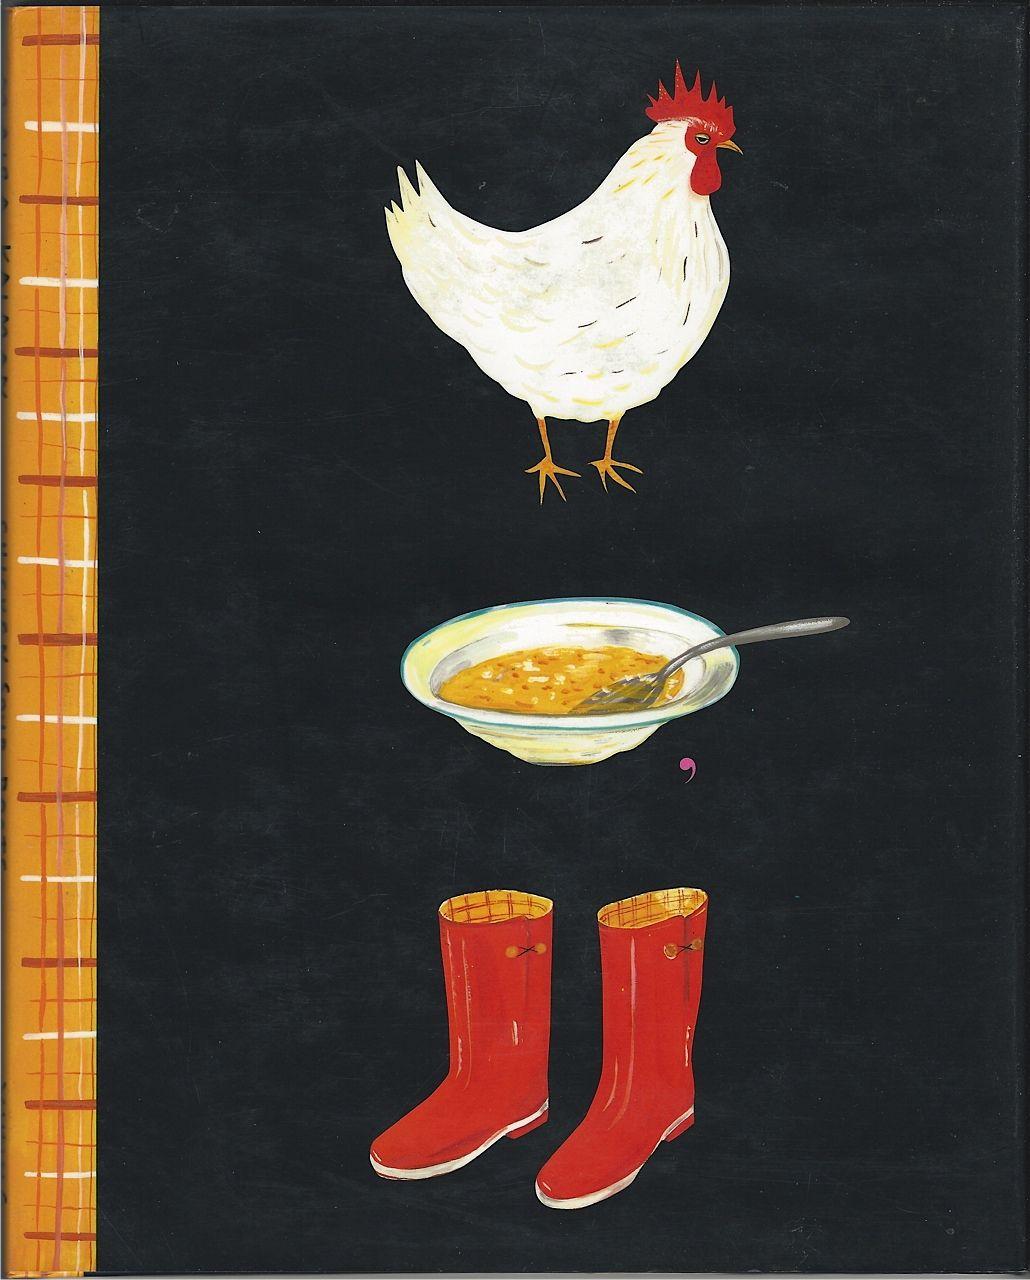 Chicken Soup, Boots by Maira Kalman 1993